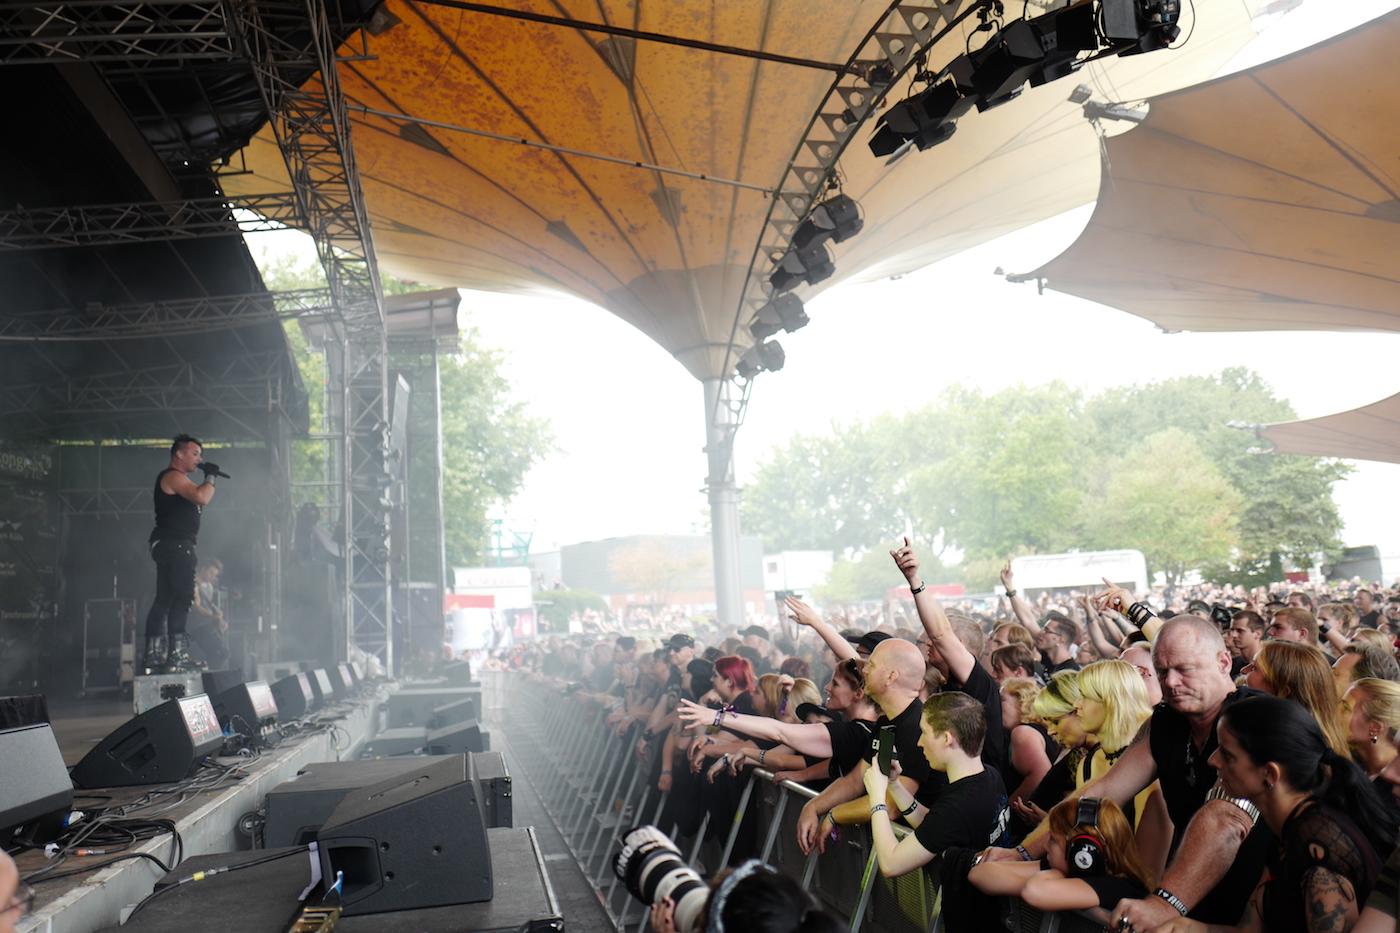 mark_benecke_amphi_festival_koeln_cologne_tanzbrunnen_gothic_OMD_oomph_agonoize_mono_inc_es23_sitd_solar_fake - 122.jpg